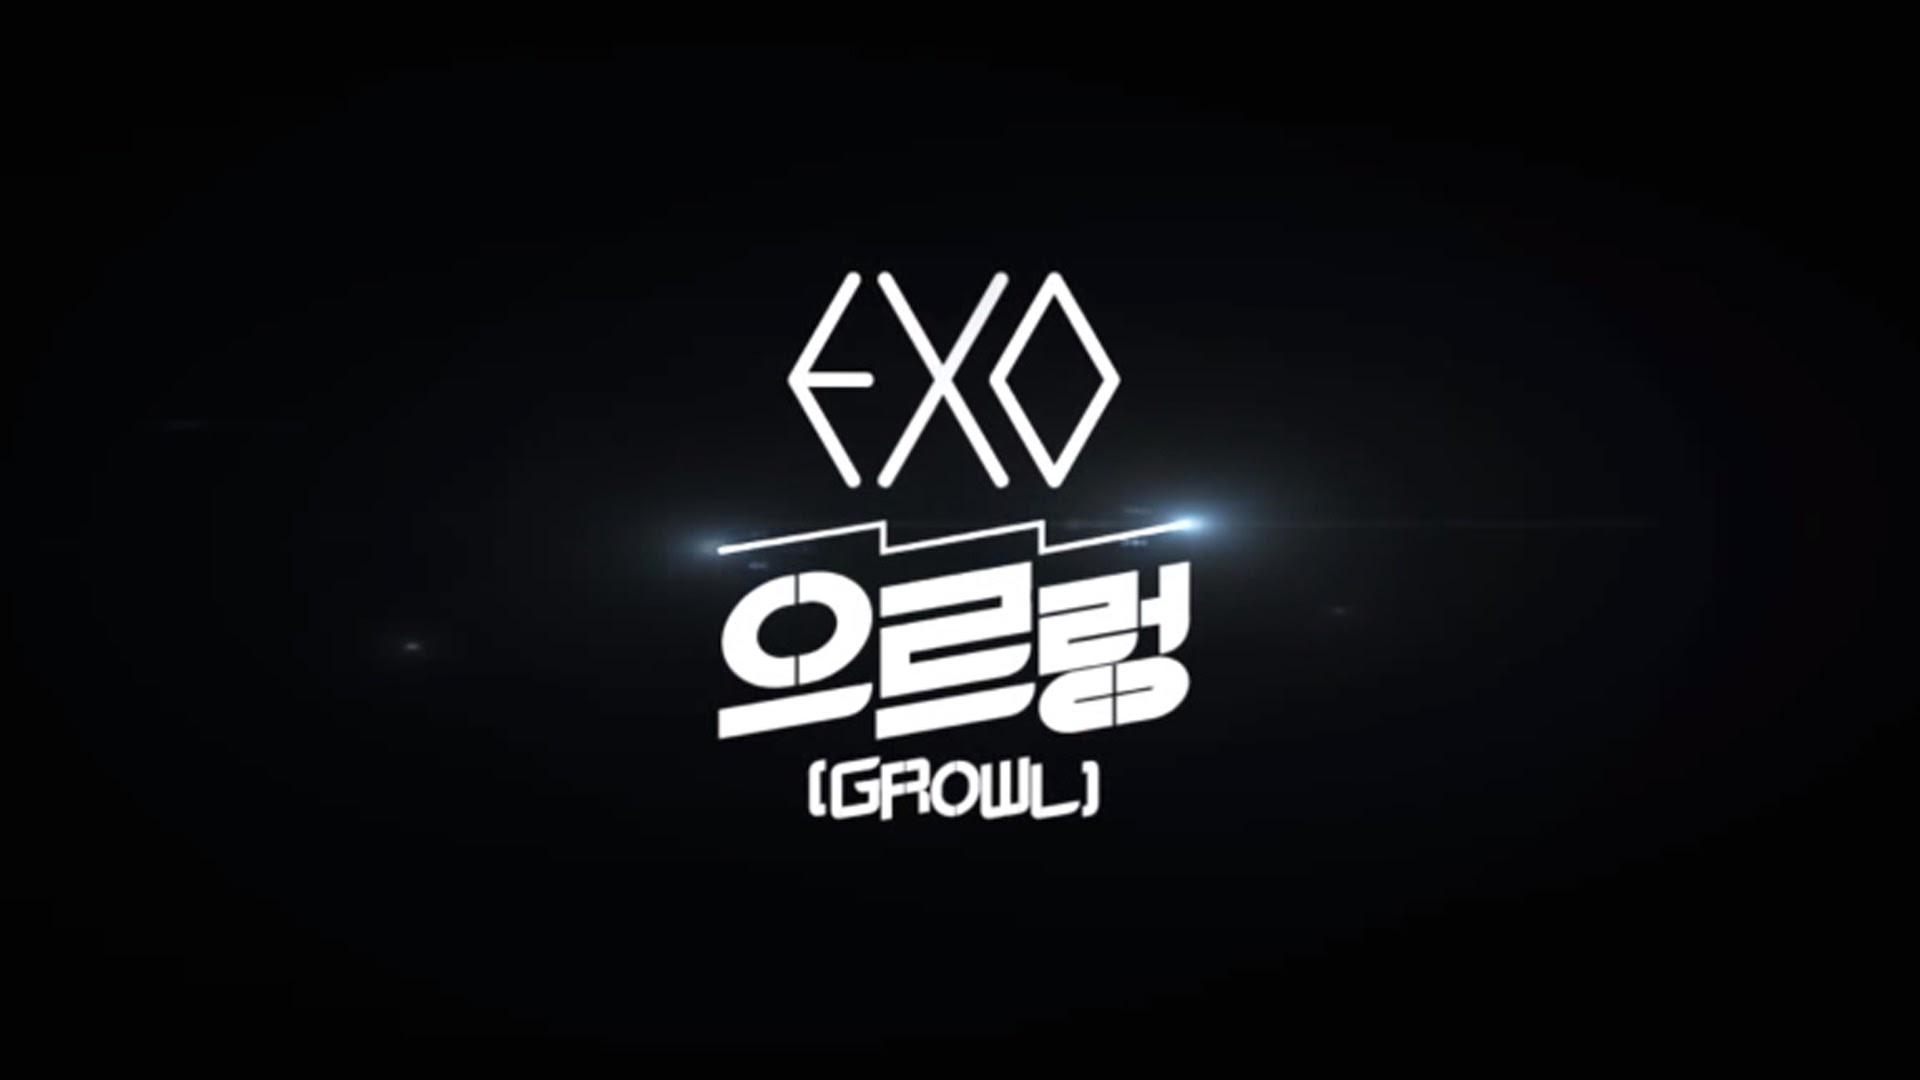 Exo Wallpaper Growl Cover photo 1920x1080